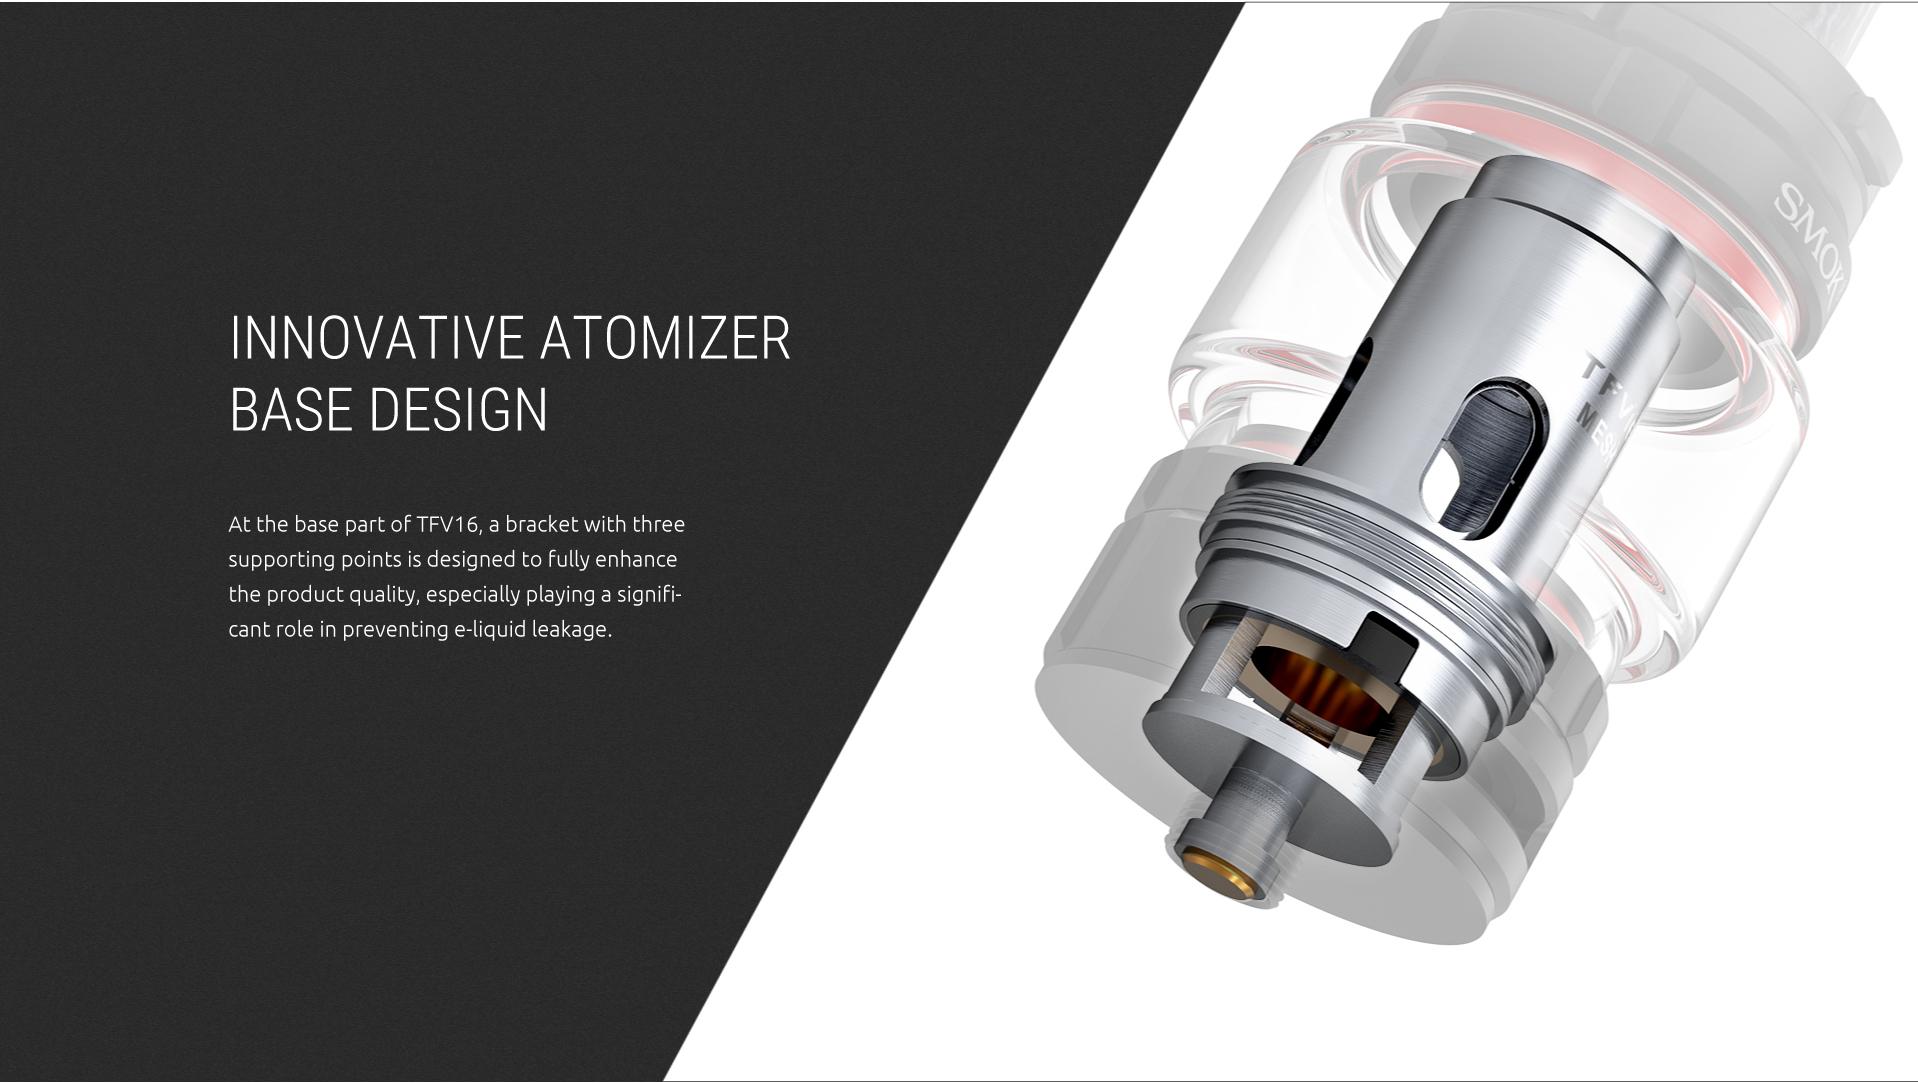 SMOK TFV16 Tank'S Innovative Atomizer Base Design